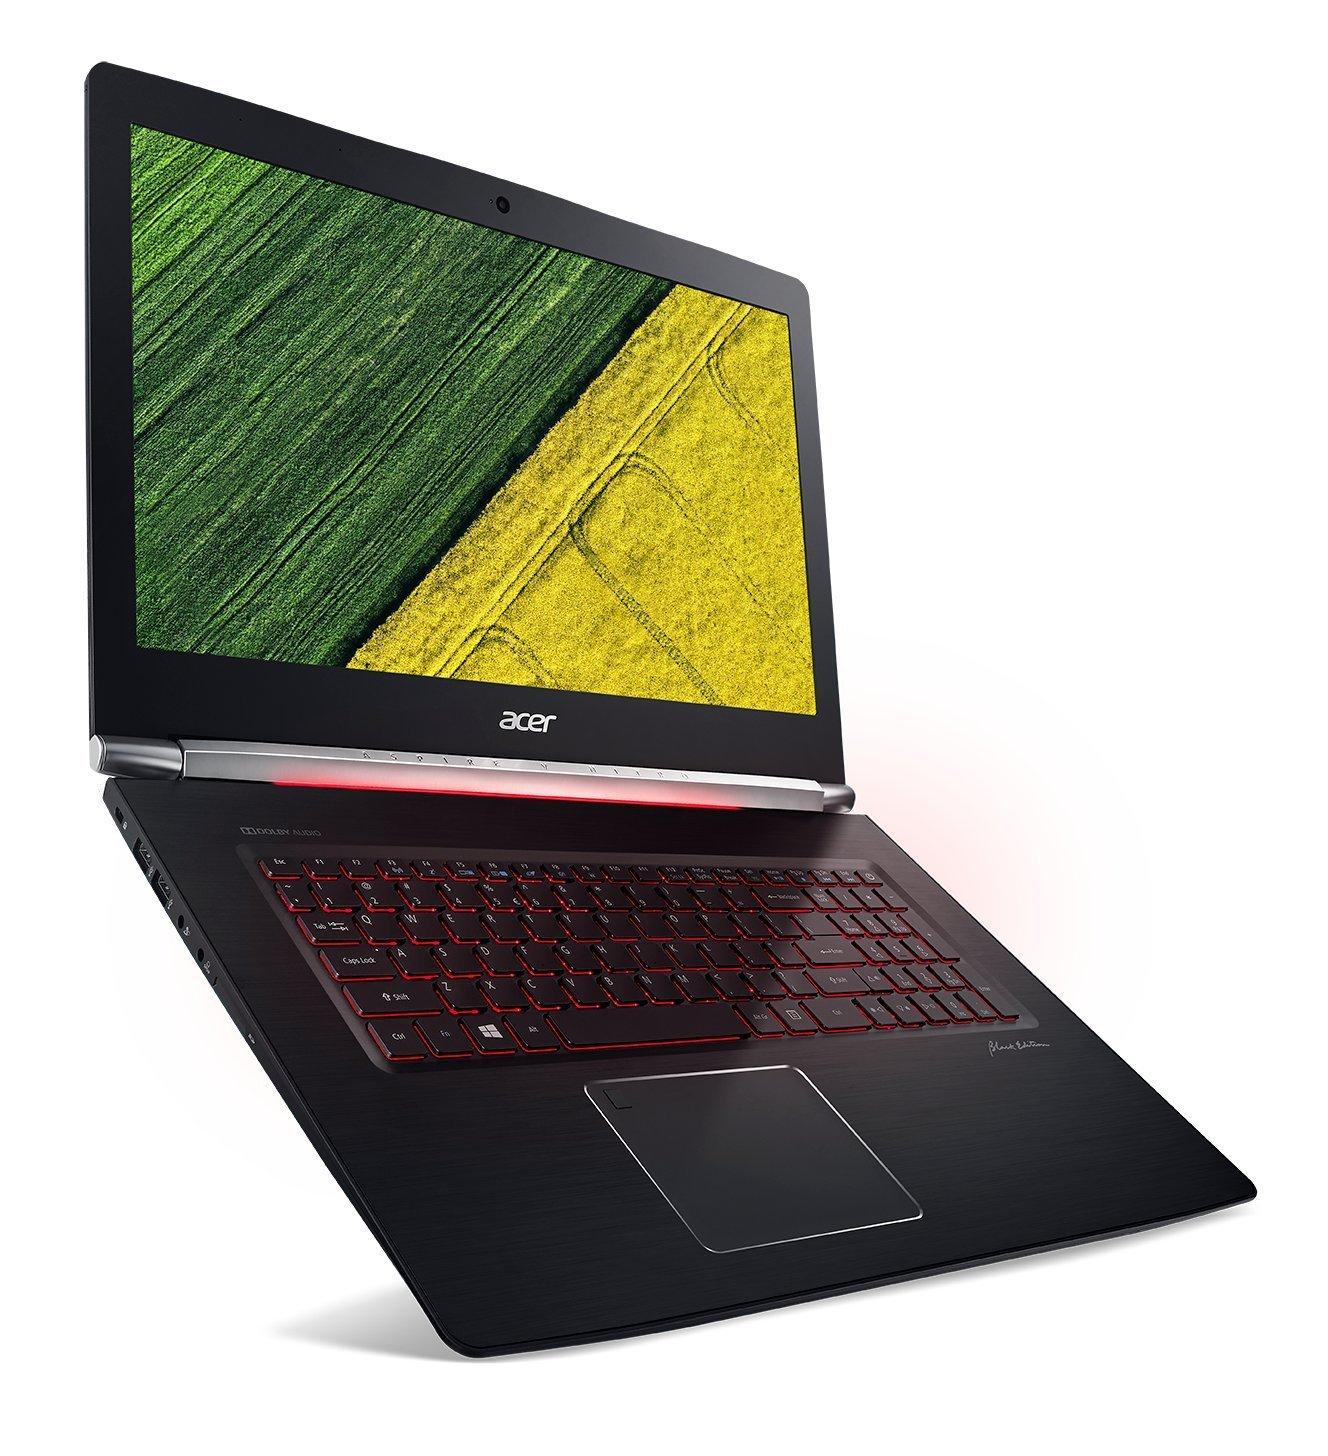 "PC Portable 17.3"" Acer Aspire VN7-793G-58C9 - Full HD, i5-7300HQ, RAM 8 Go, HDD 1 To + SSD 256 Go, GTX 1050 Ti 4 Go, Windows 10"